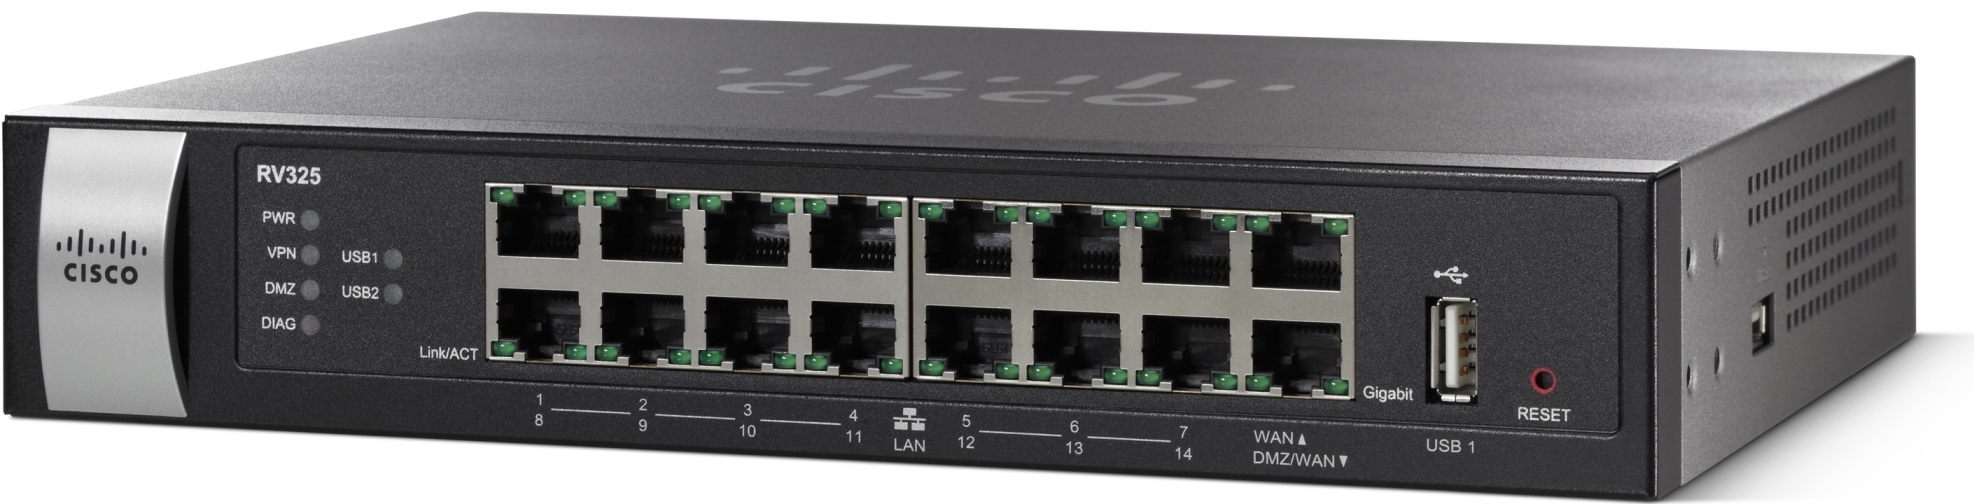 Cisco RV325, 2x Gigabit WAN, 4x Gigabit LAN VPN Router